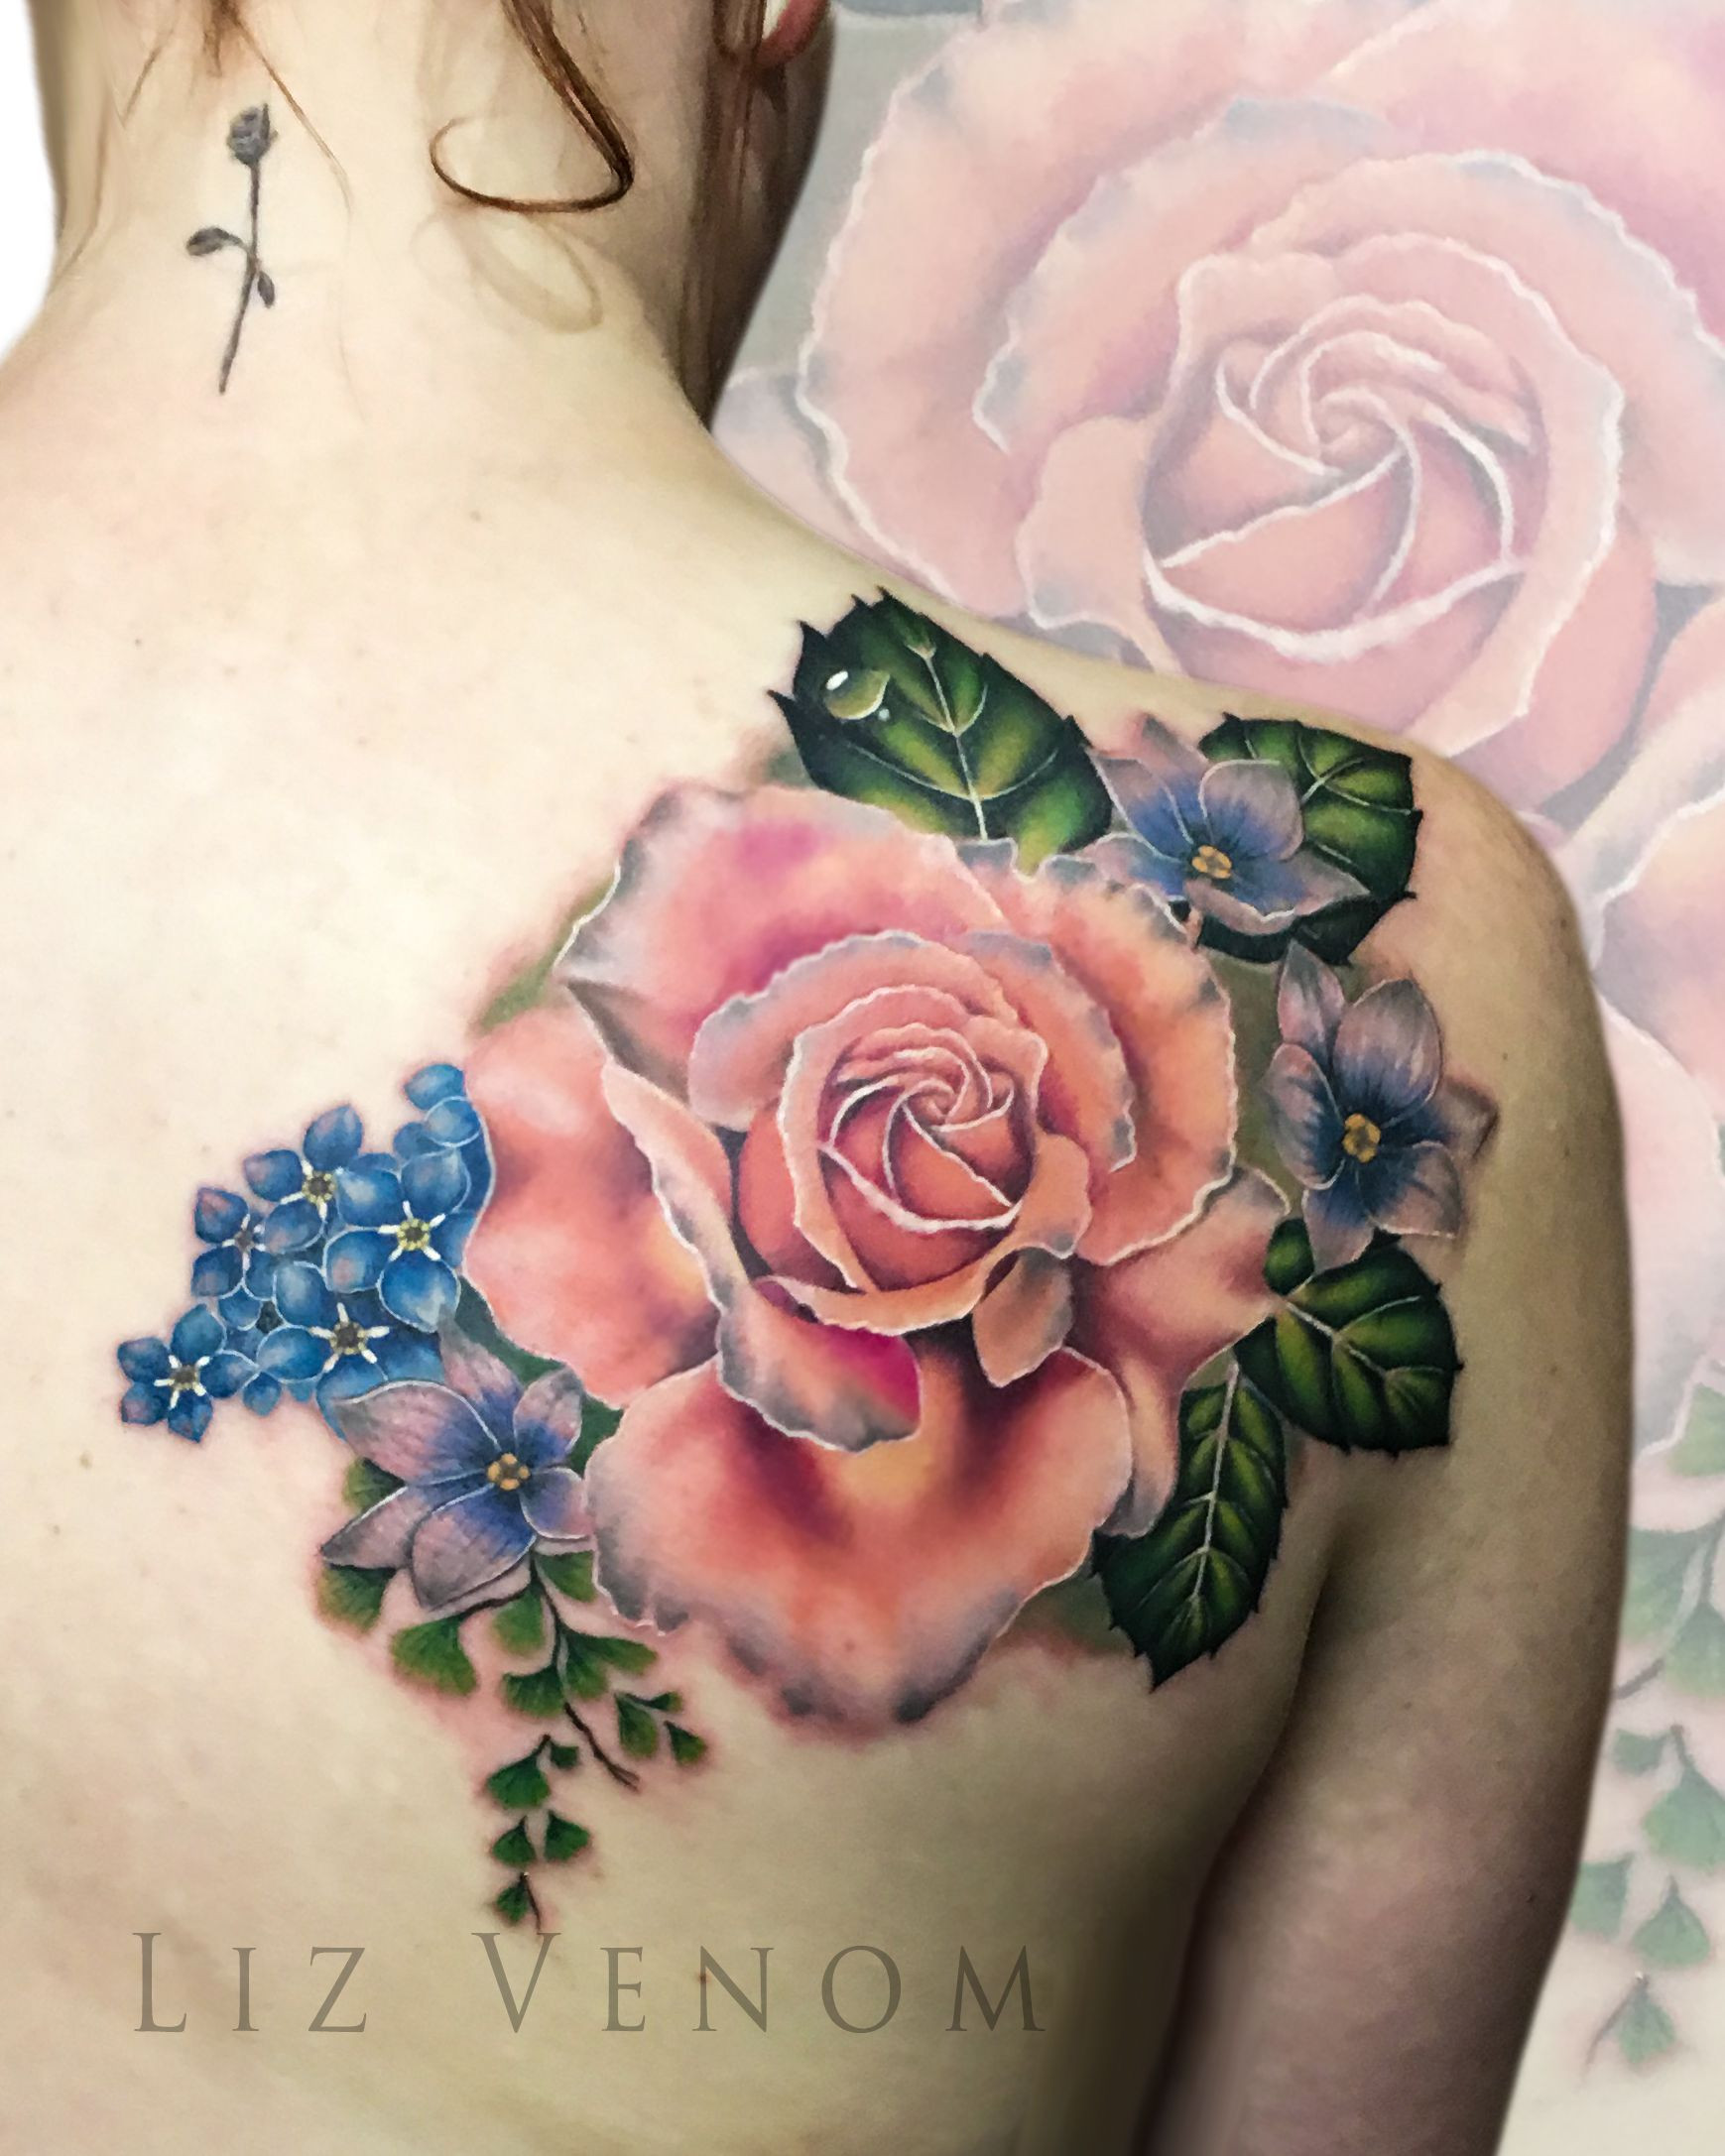 A vintage inspired floral arrangement by Liz Venom ink tattoos tattooed edmonton art artist amazing beautiful best floral realism realistic